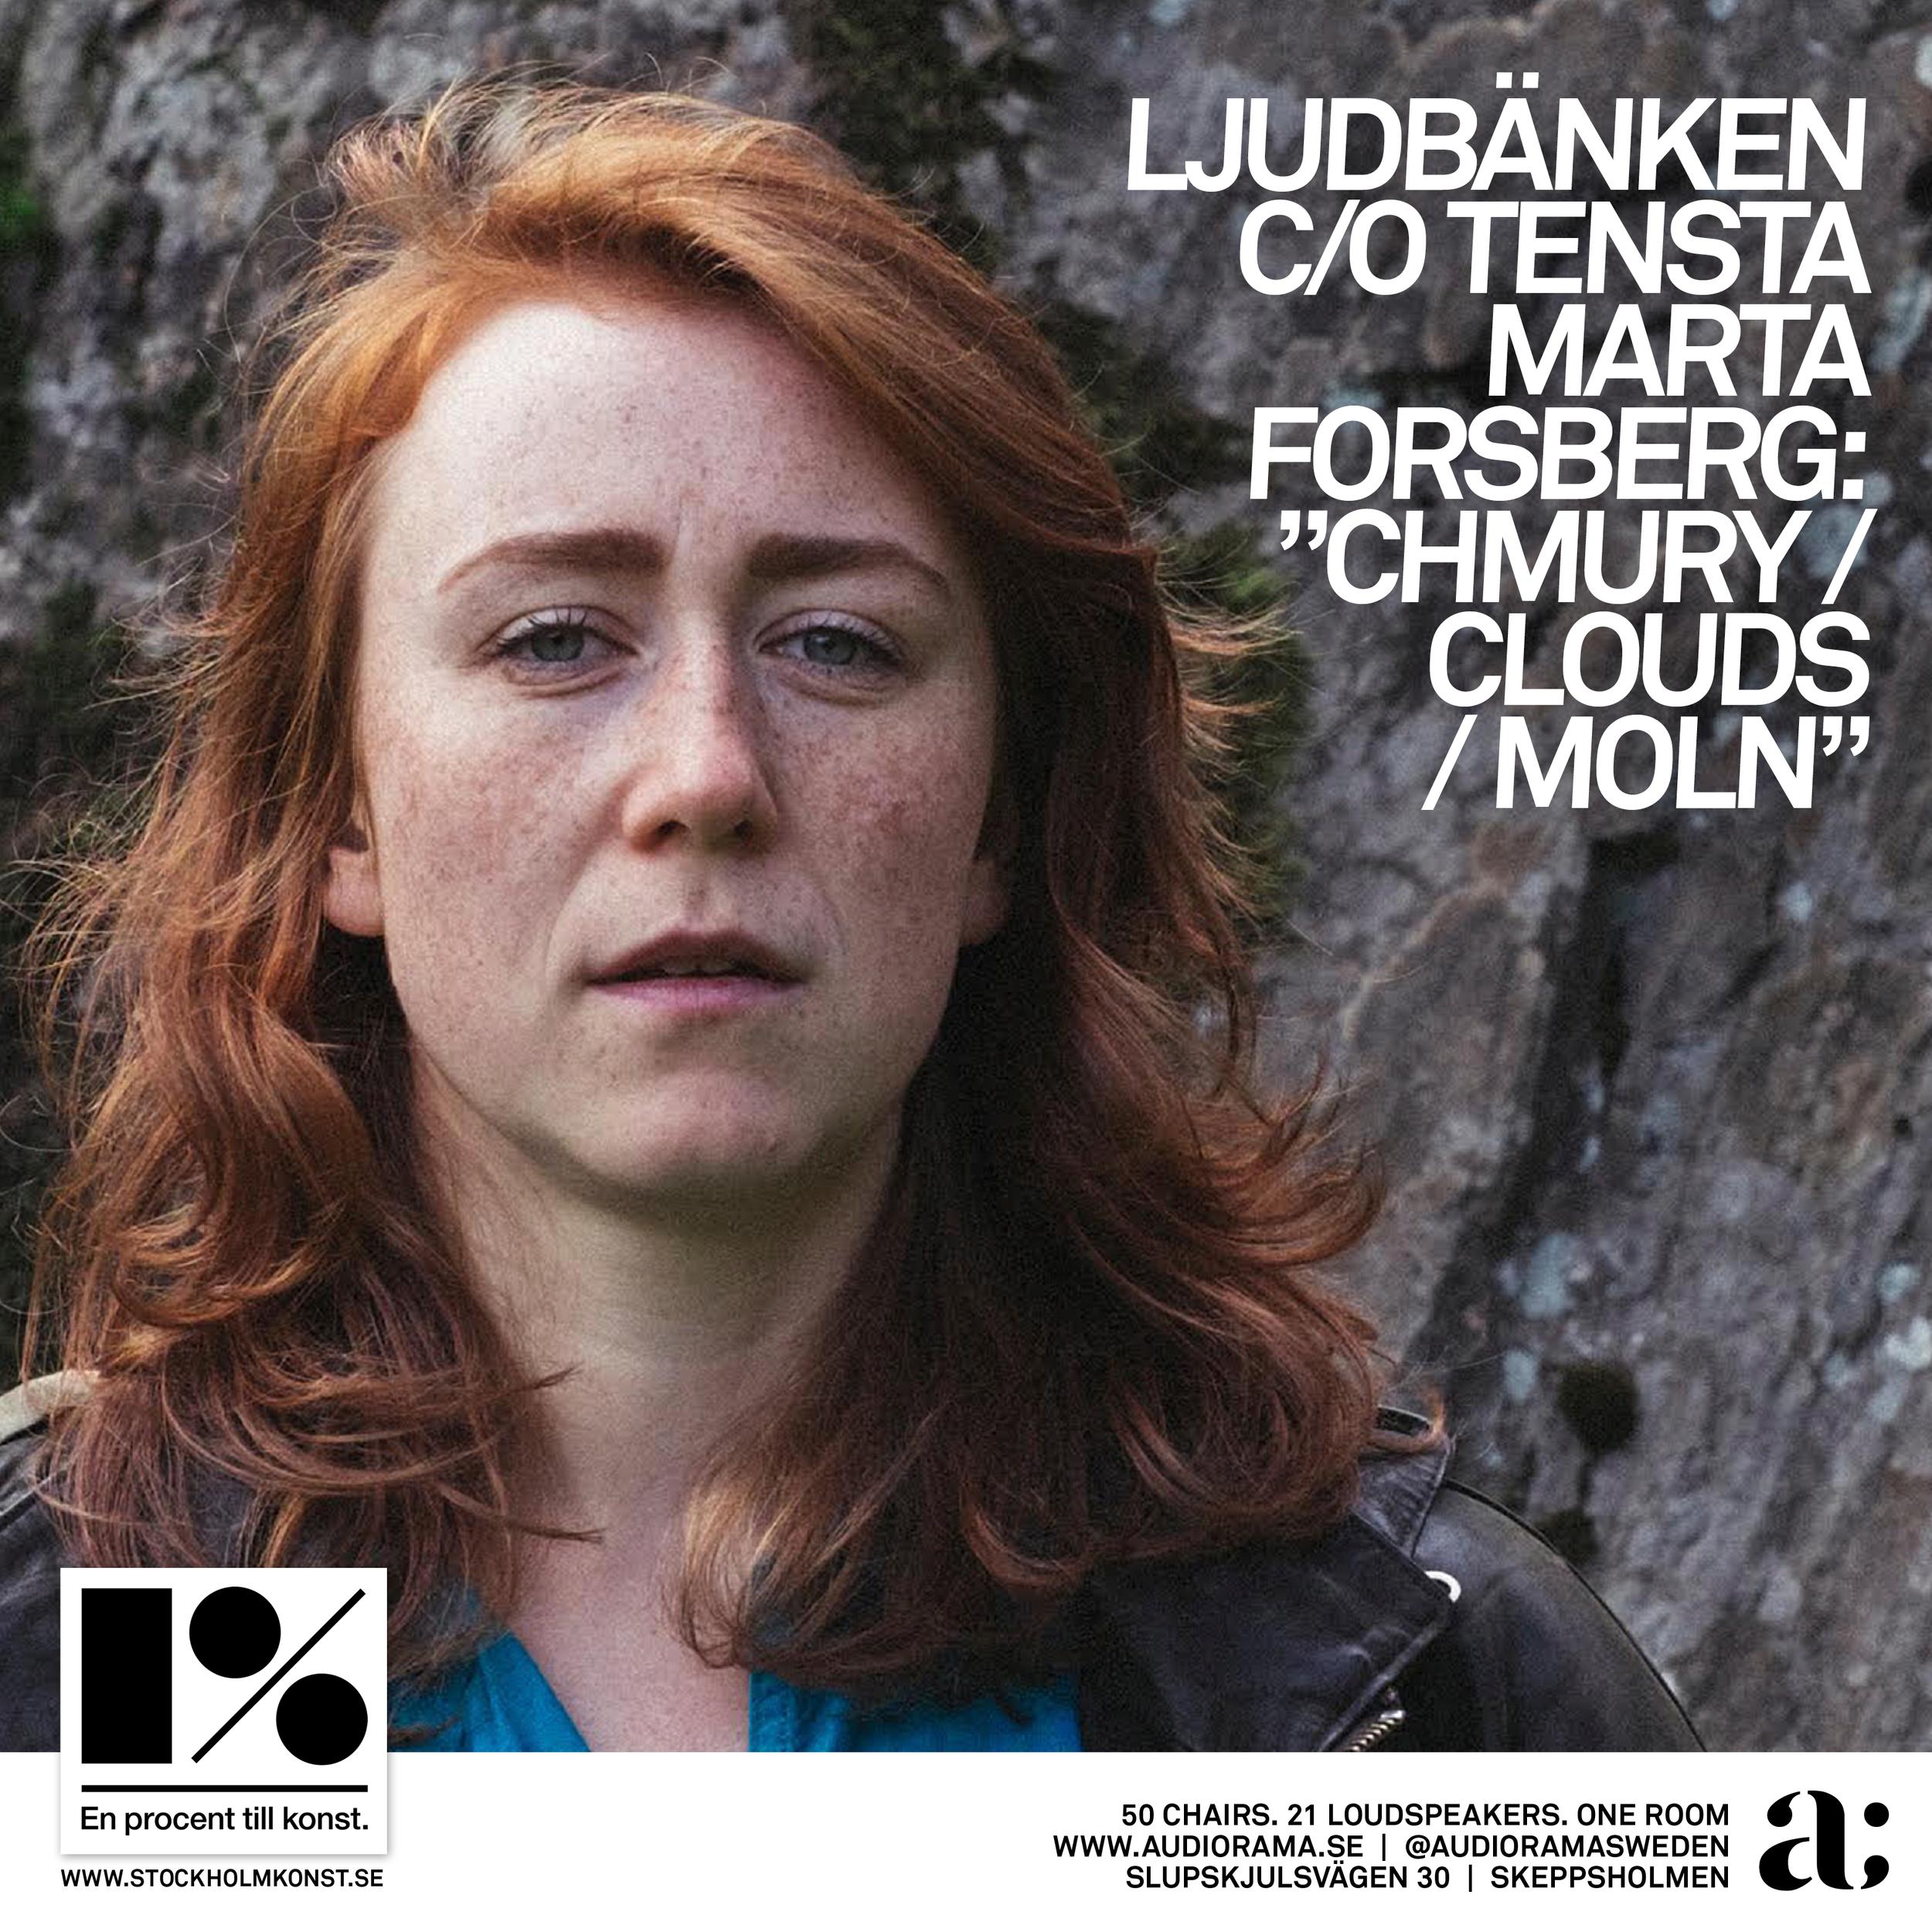 Ljudbanken-Marta-Forsberg-1500x1500.png